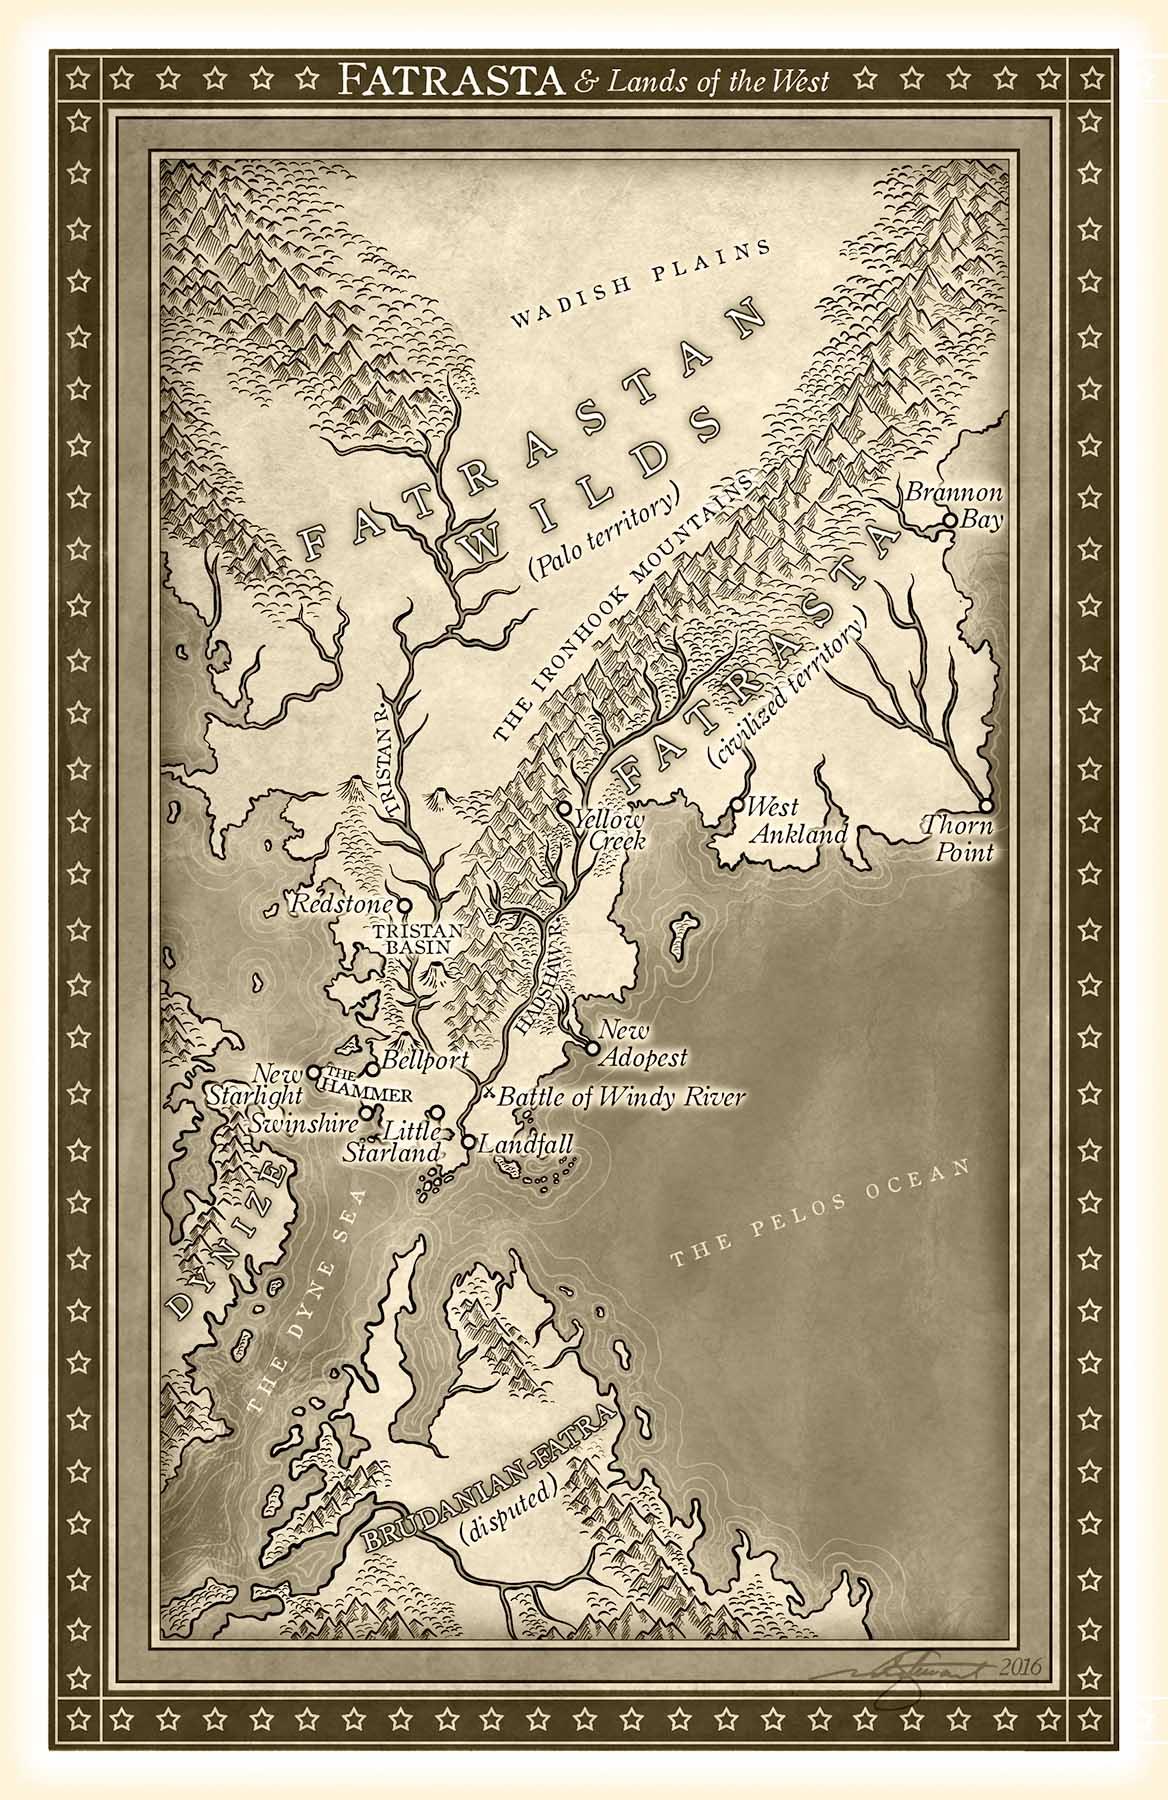 Book 5 fatrasta_regional_map_web.jpg